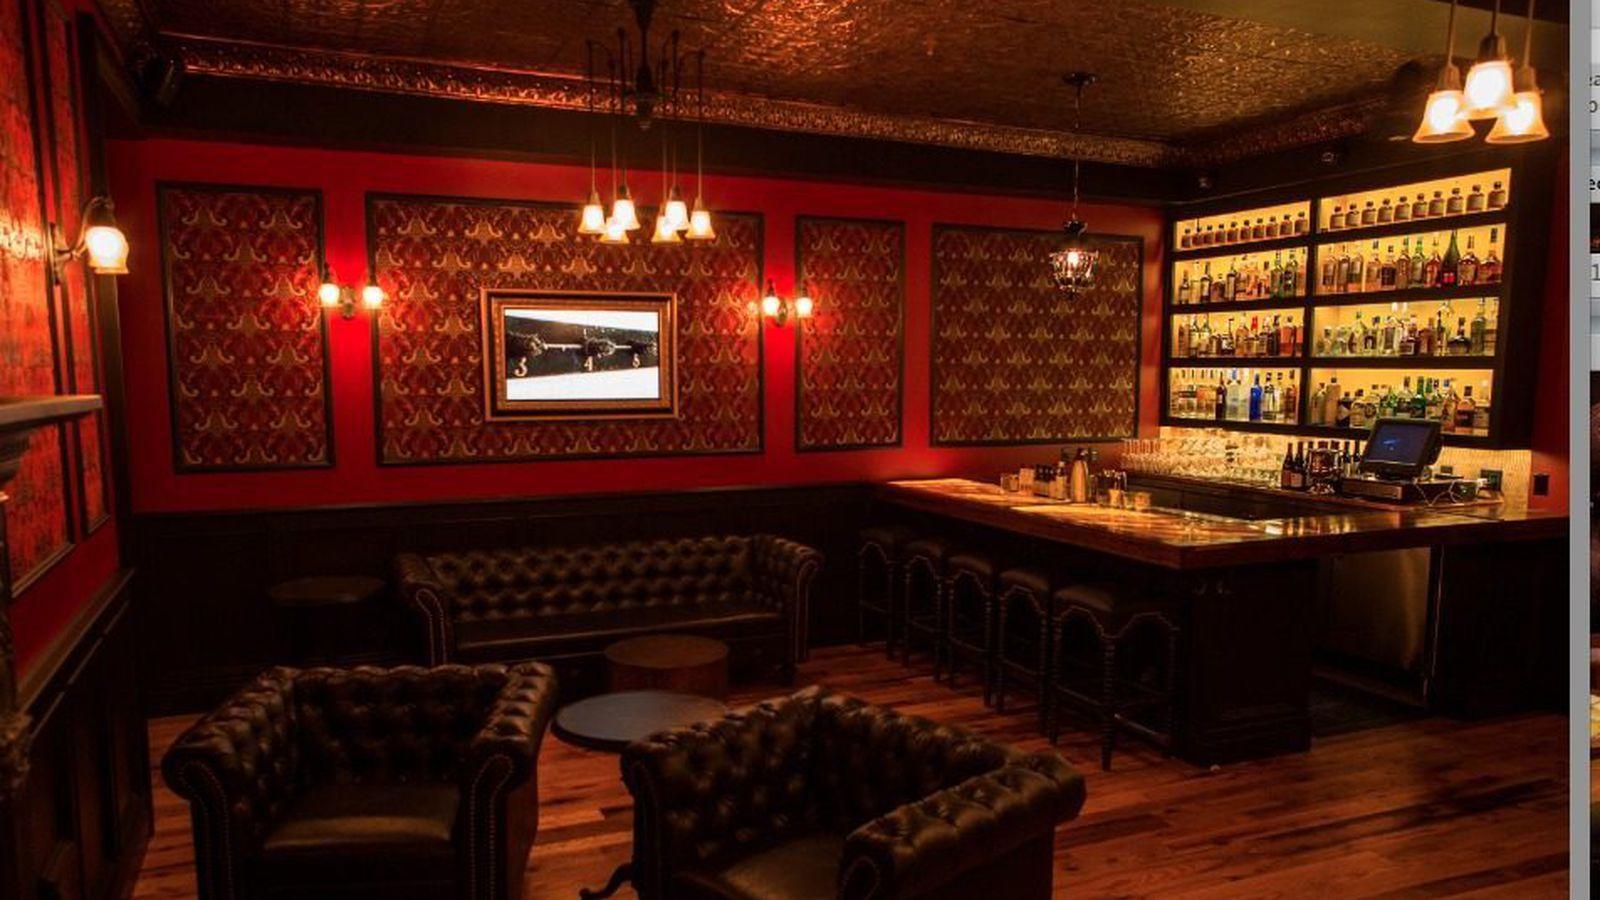 Kinks New Bar The Armory Club Opens Tomorrow  Eater SF